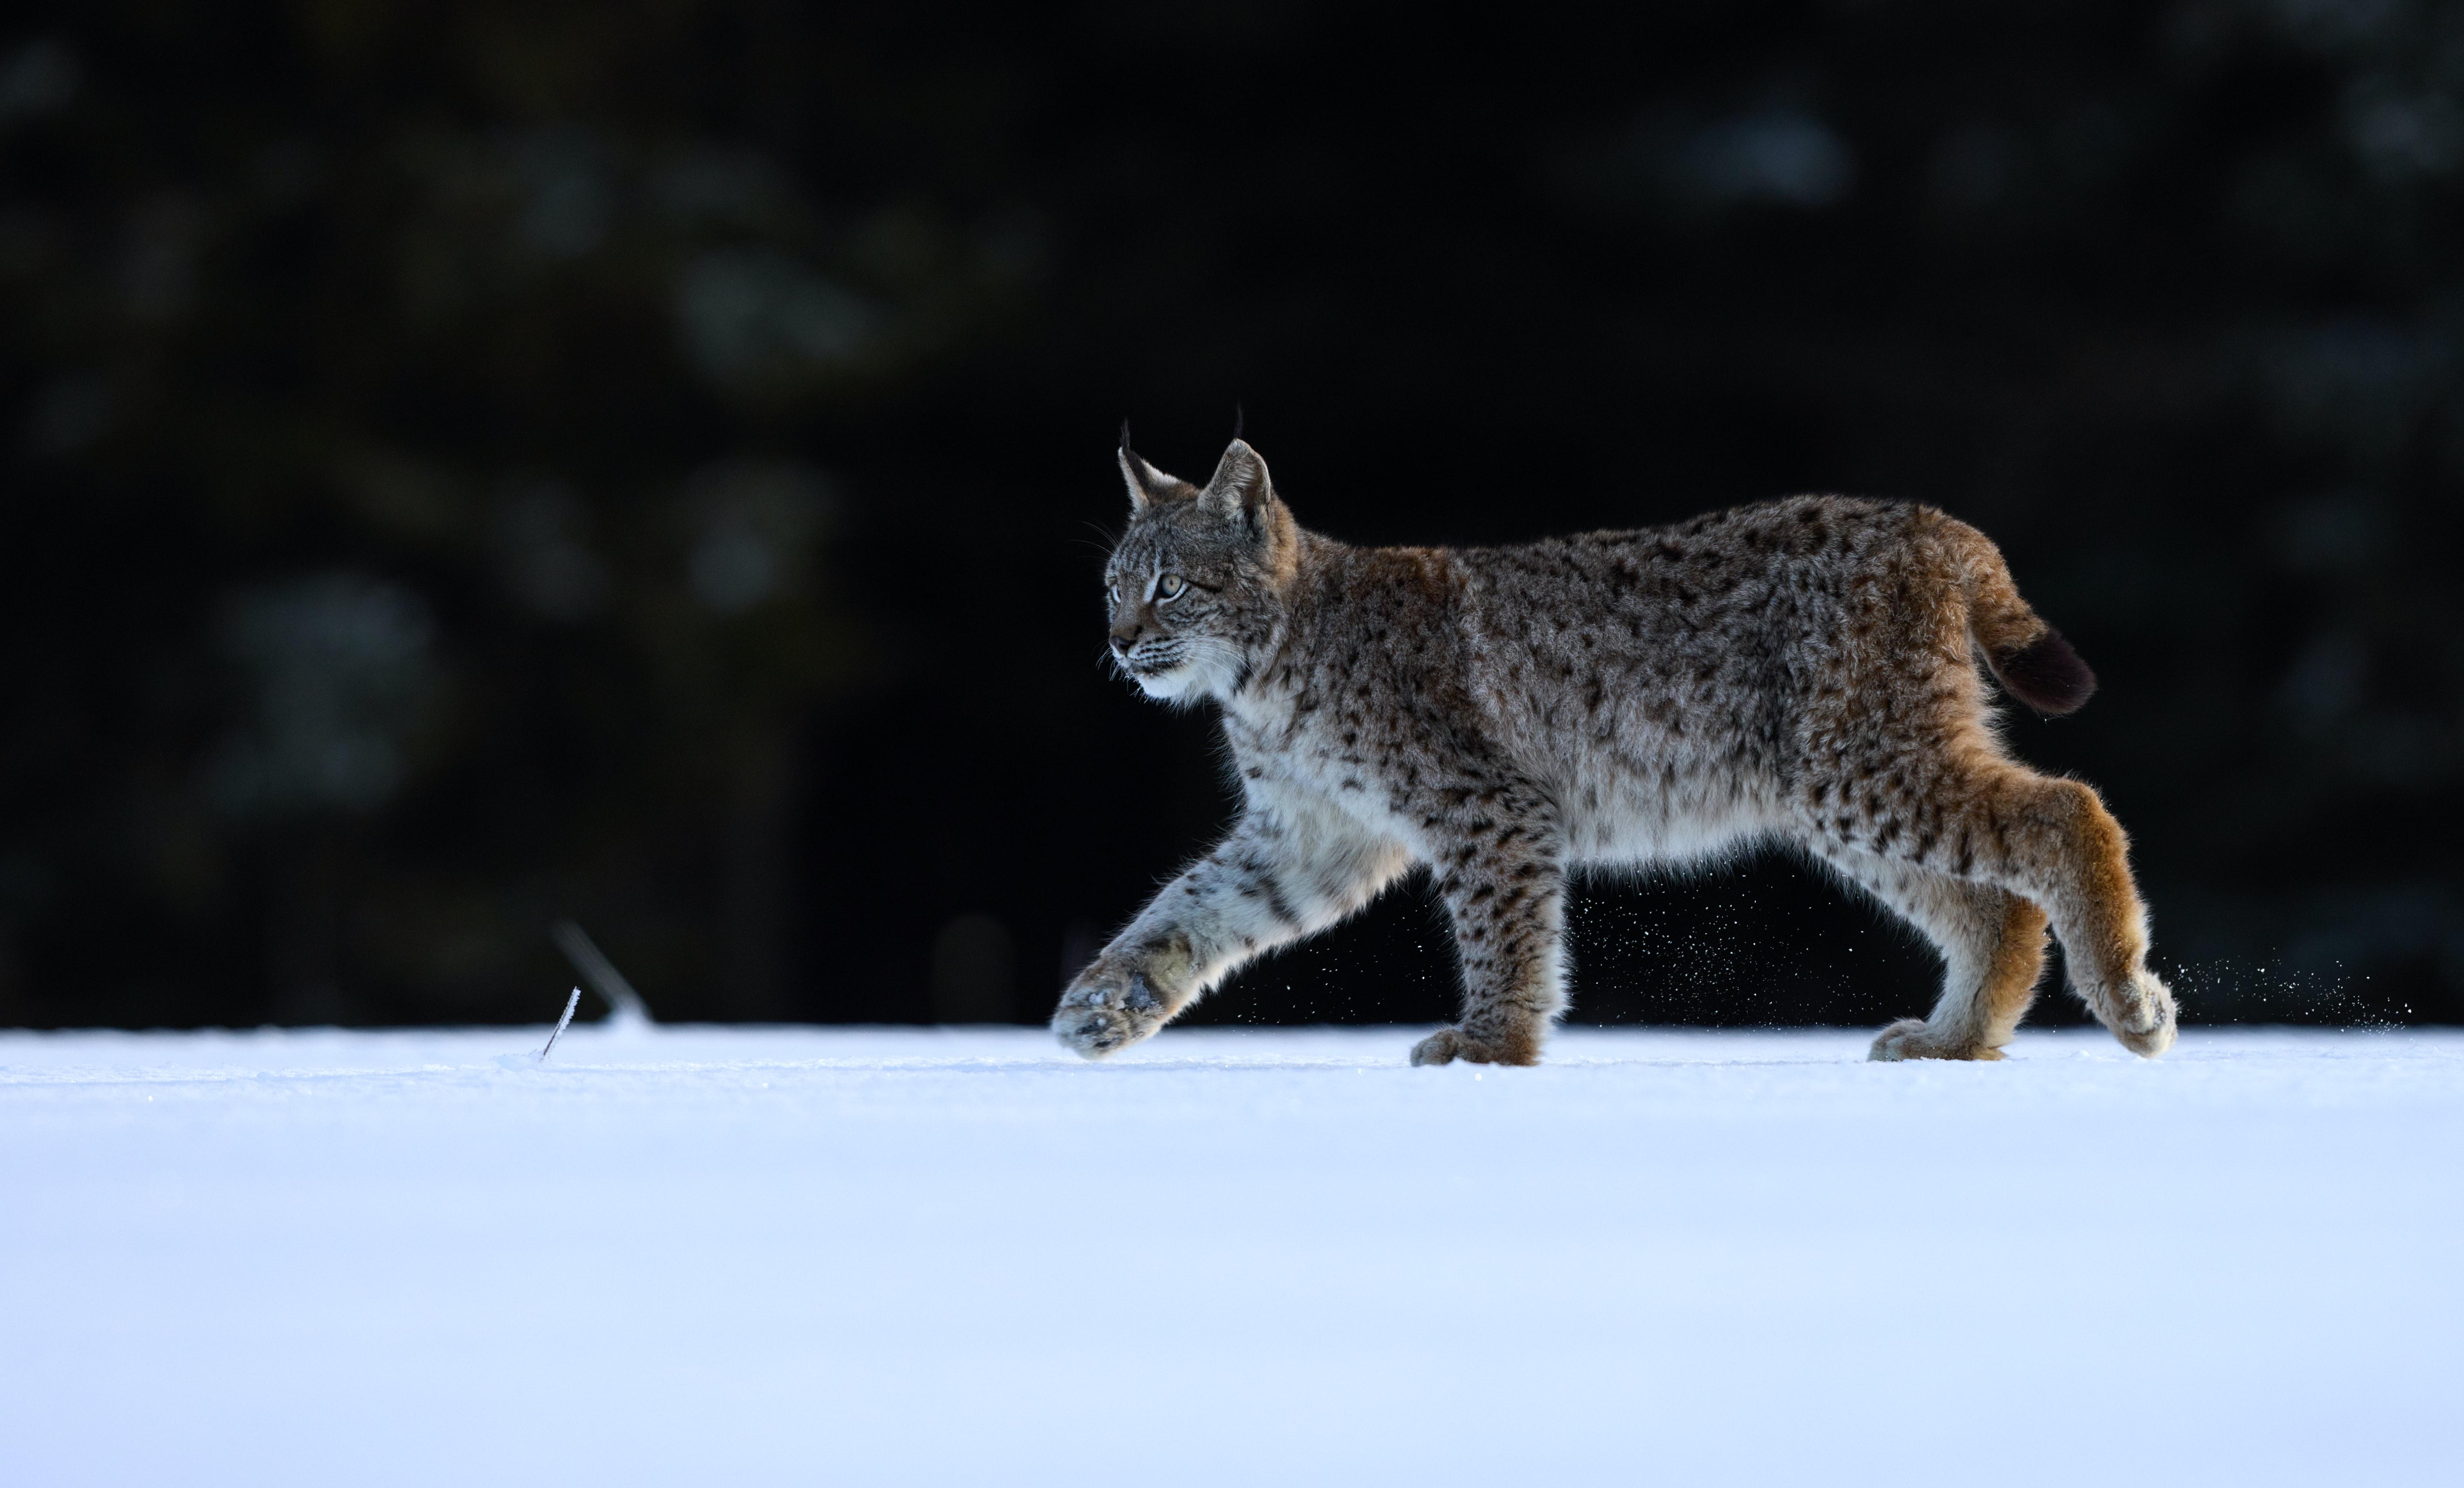 88223 download wallpaper Animals, Iris, Animal, Predator, Big Cat, Wildlife screensavers and pictures for free